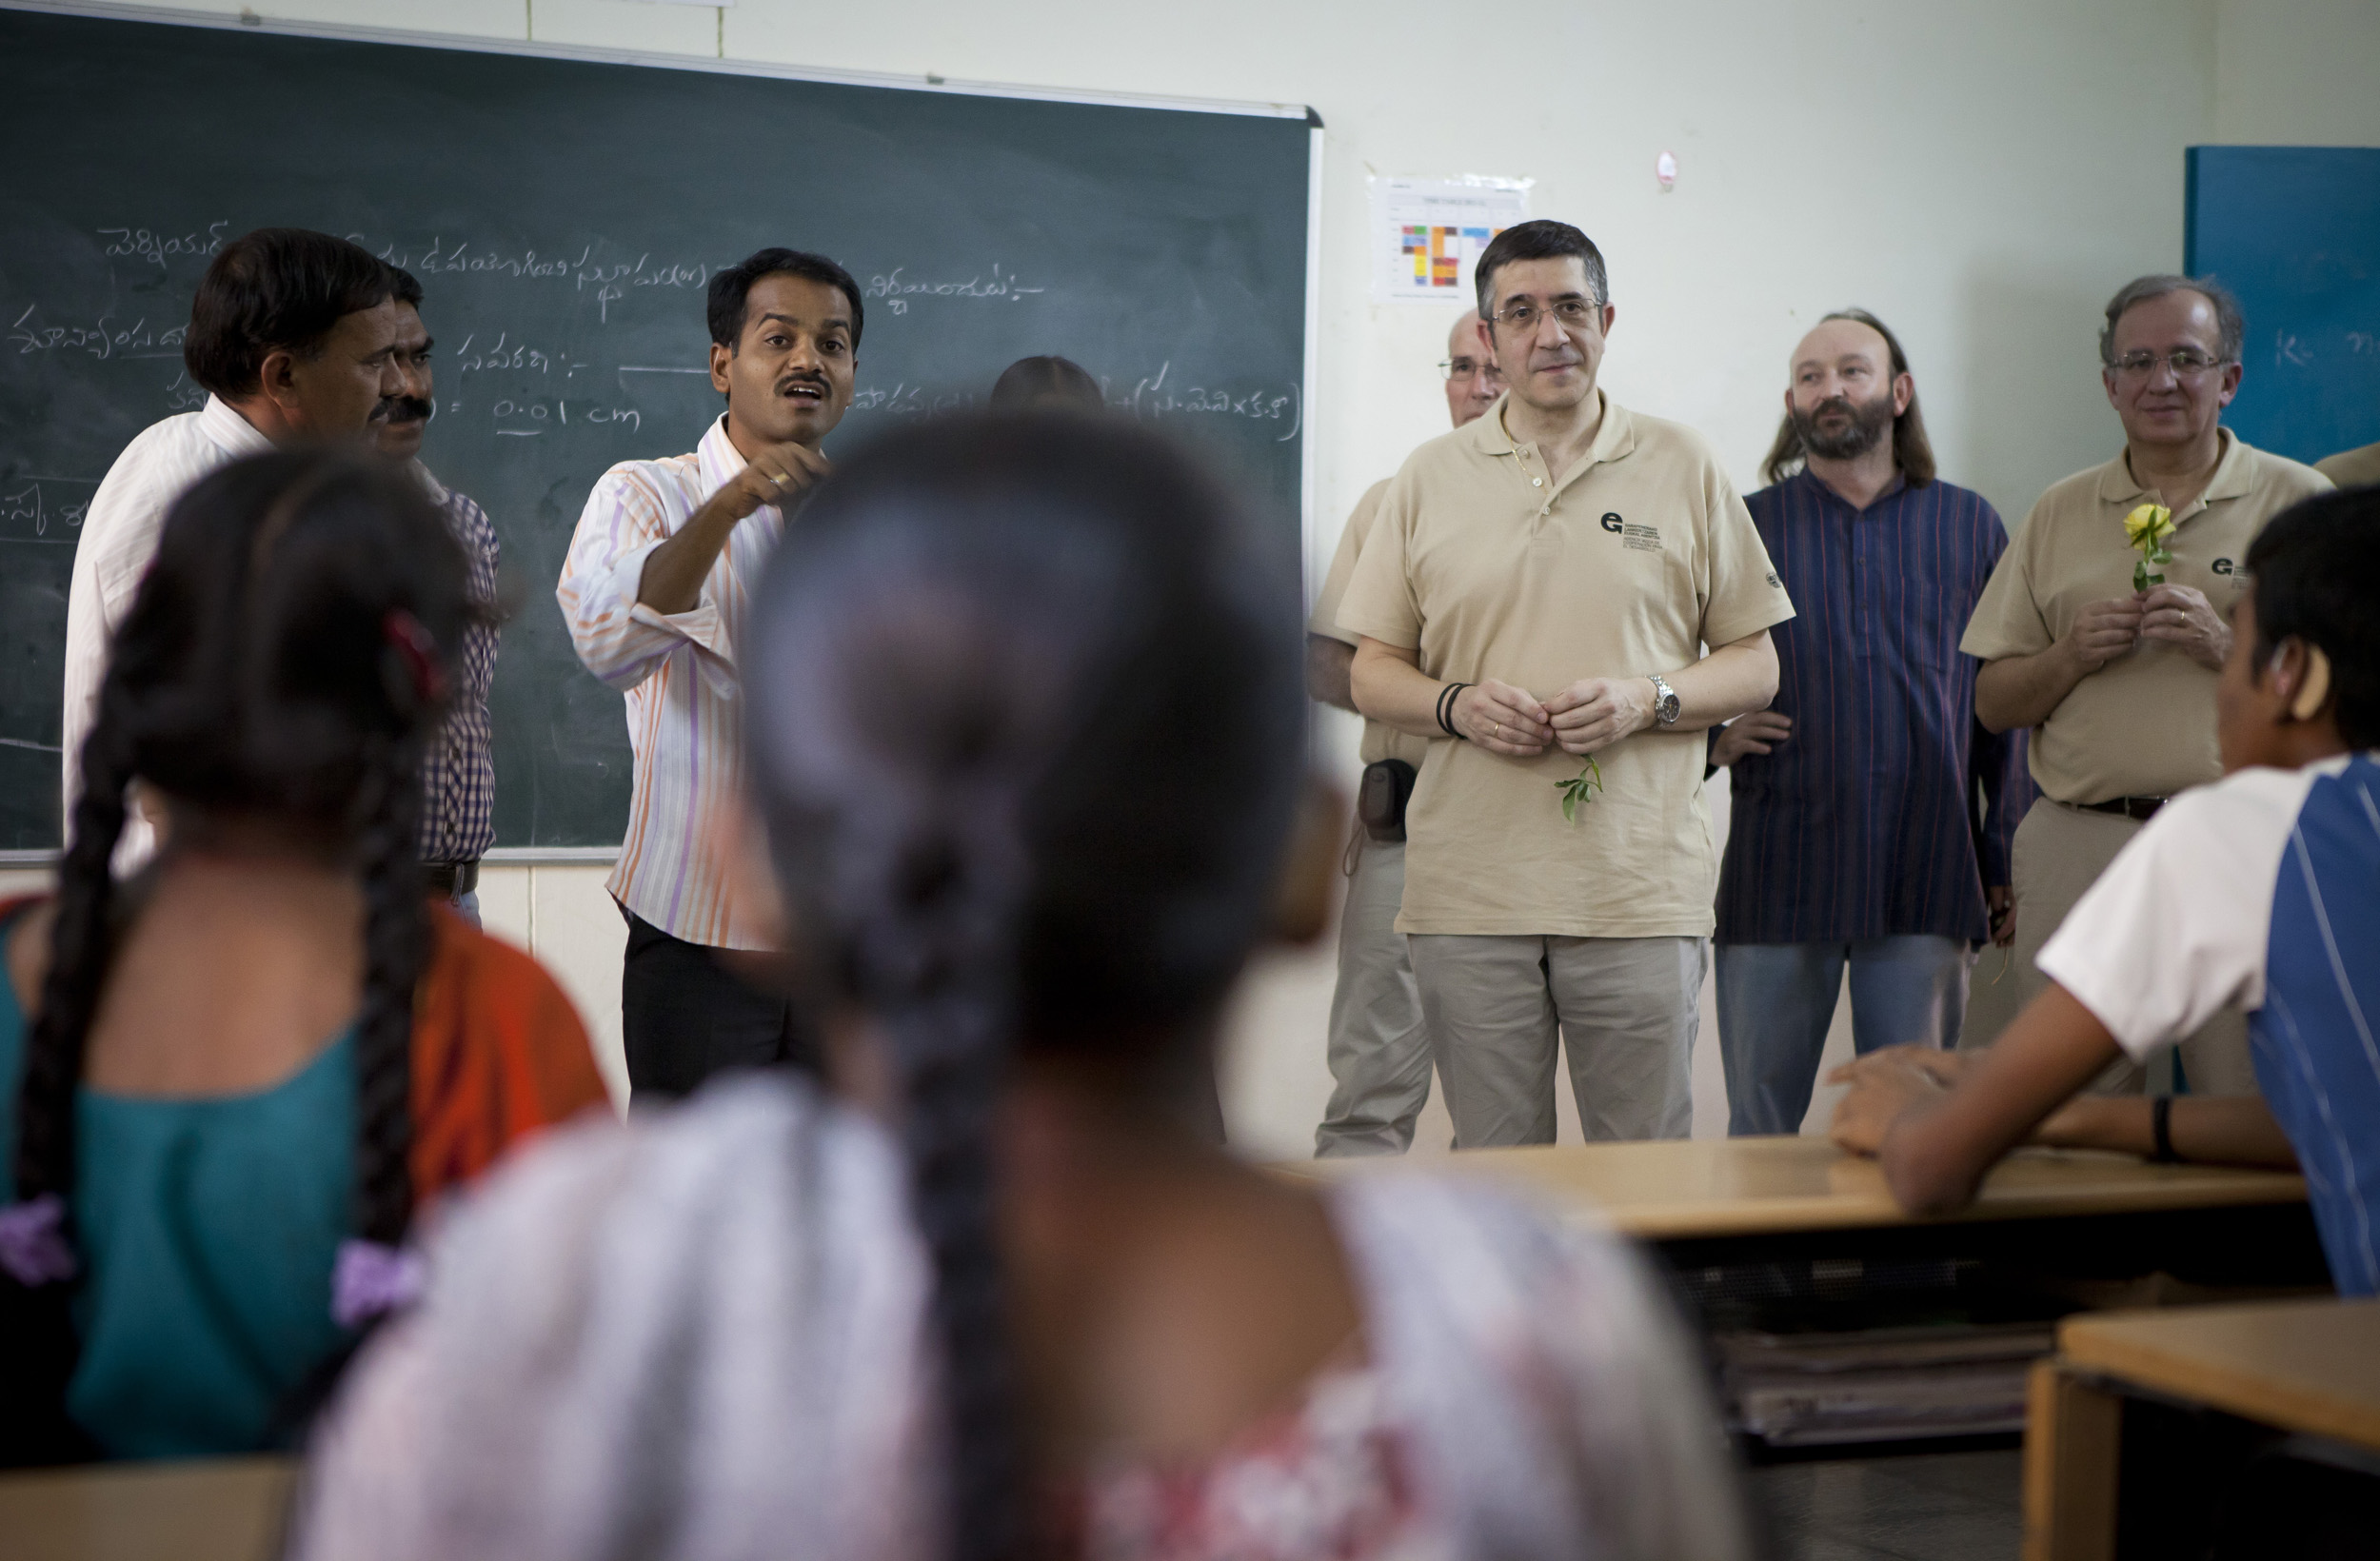 2012_03_17_vicente_ferrer_escuelas12.jpg